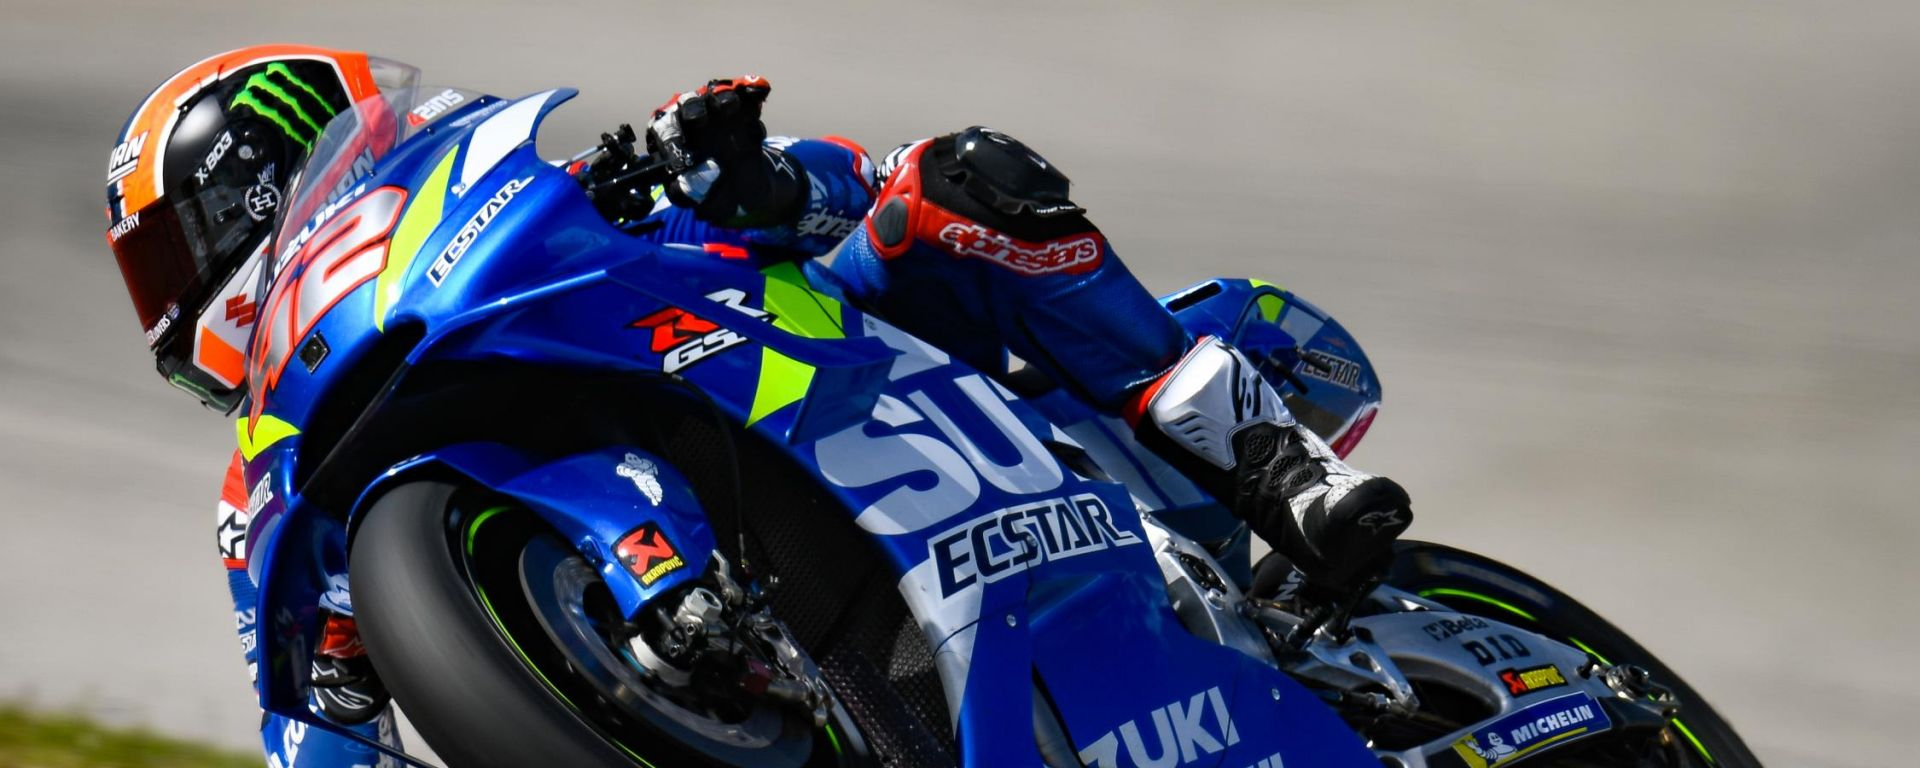 MotoGP Austin: Rins a sorpresa, Rossi beffato! Marquez giù